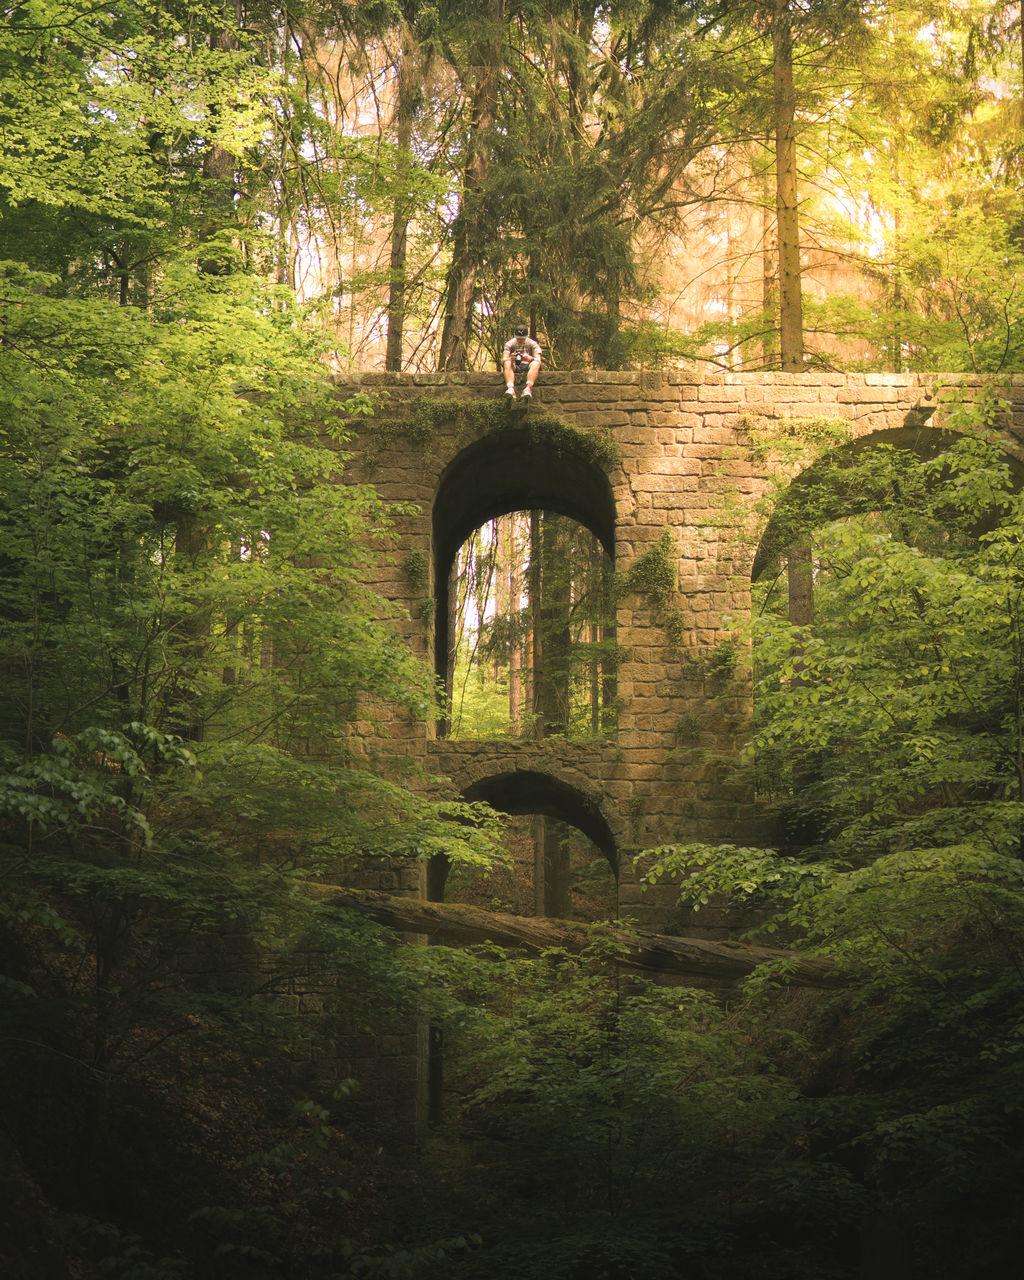 View of a hidden bridge in forest